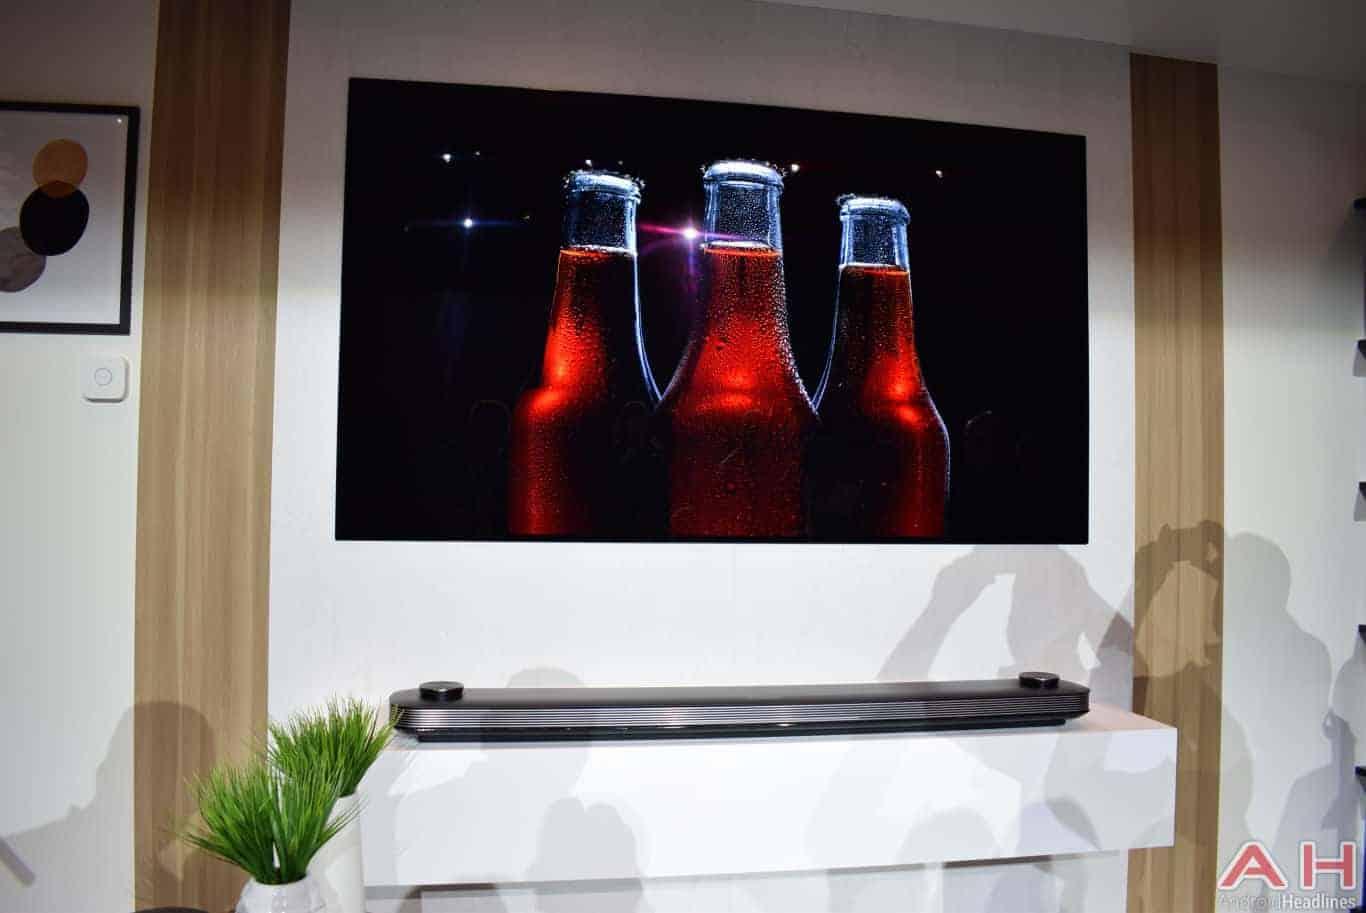 LG CES ThinQ TV AH 1 6